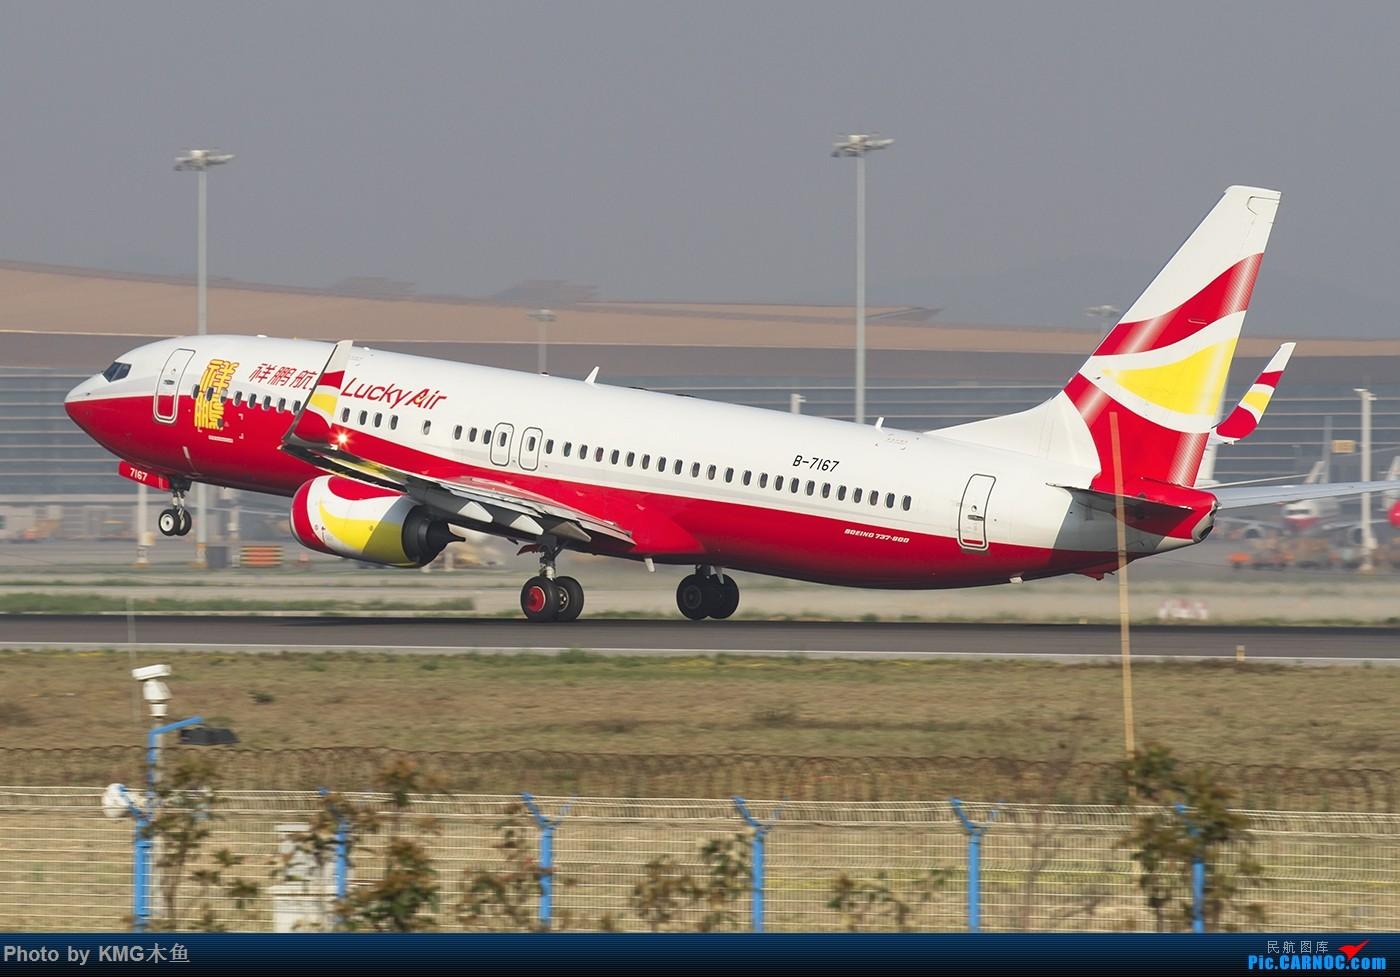 Re:[原创]【昆明飞友会—KMG木鱼】2016年4月的最后一天,去的很早,天气却不太好 BOEING 737-800 B-7167 中国昆明长水国际机场